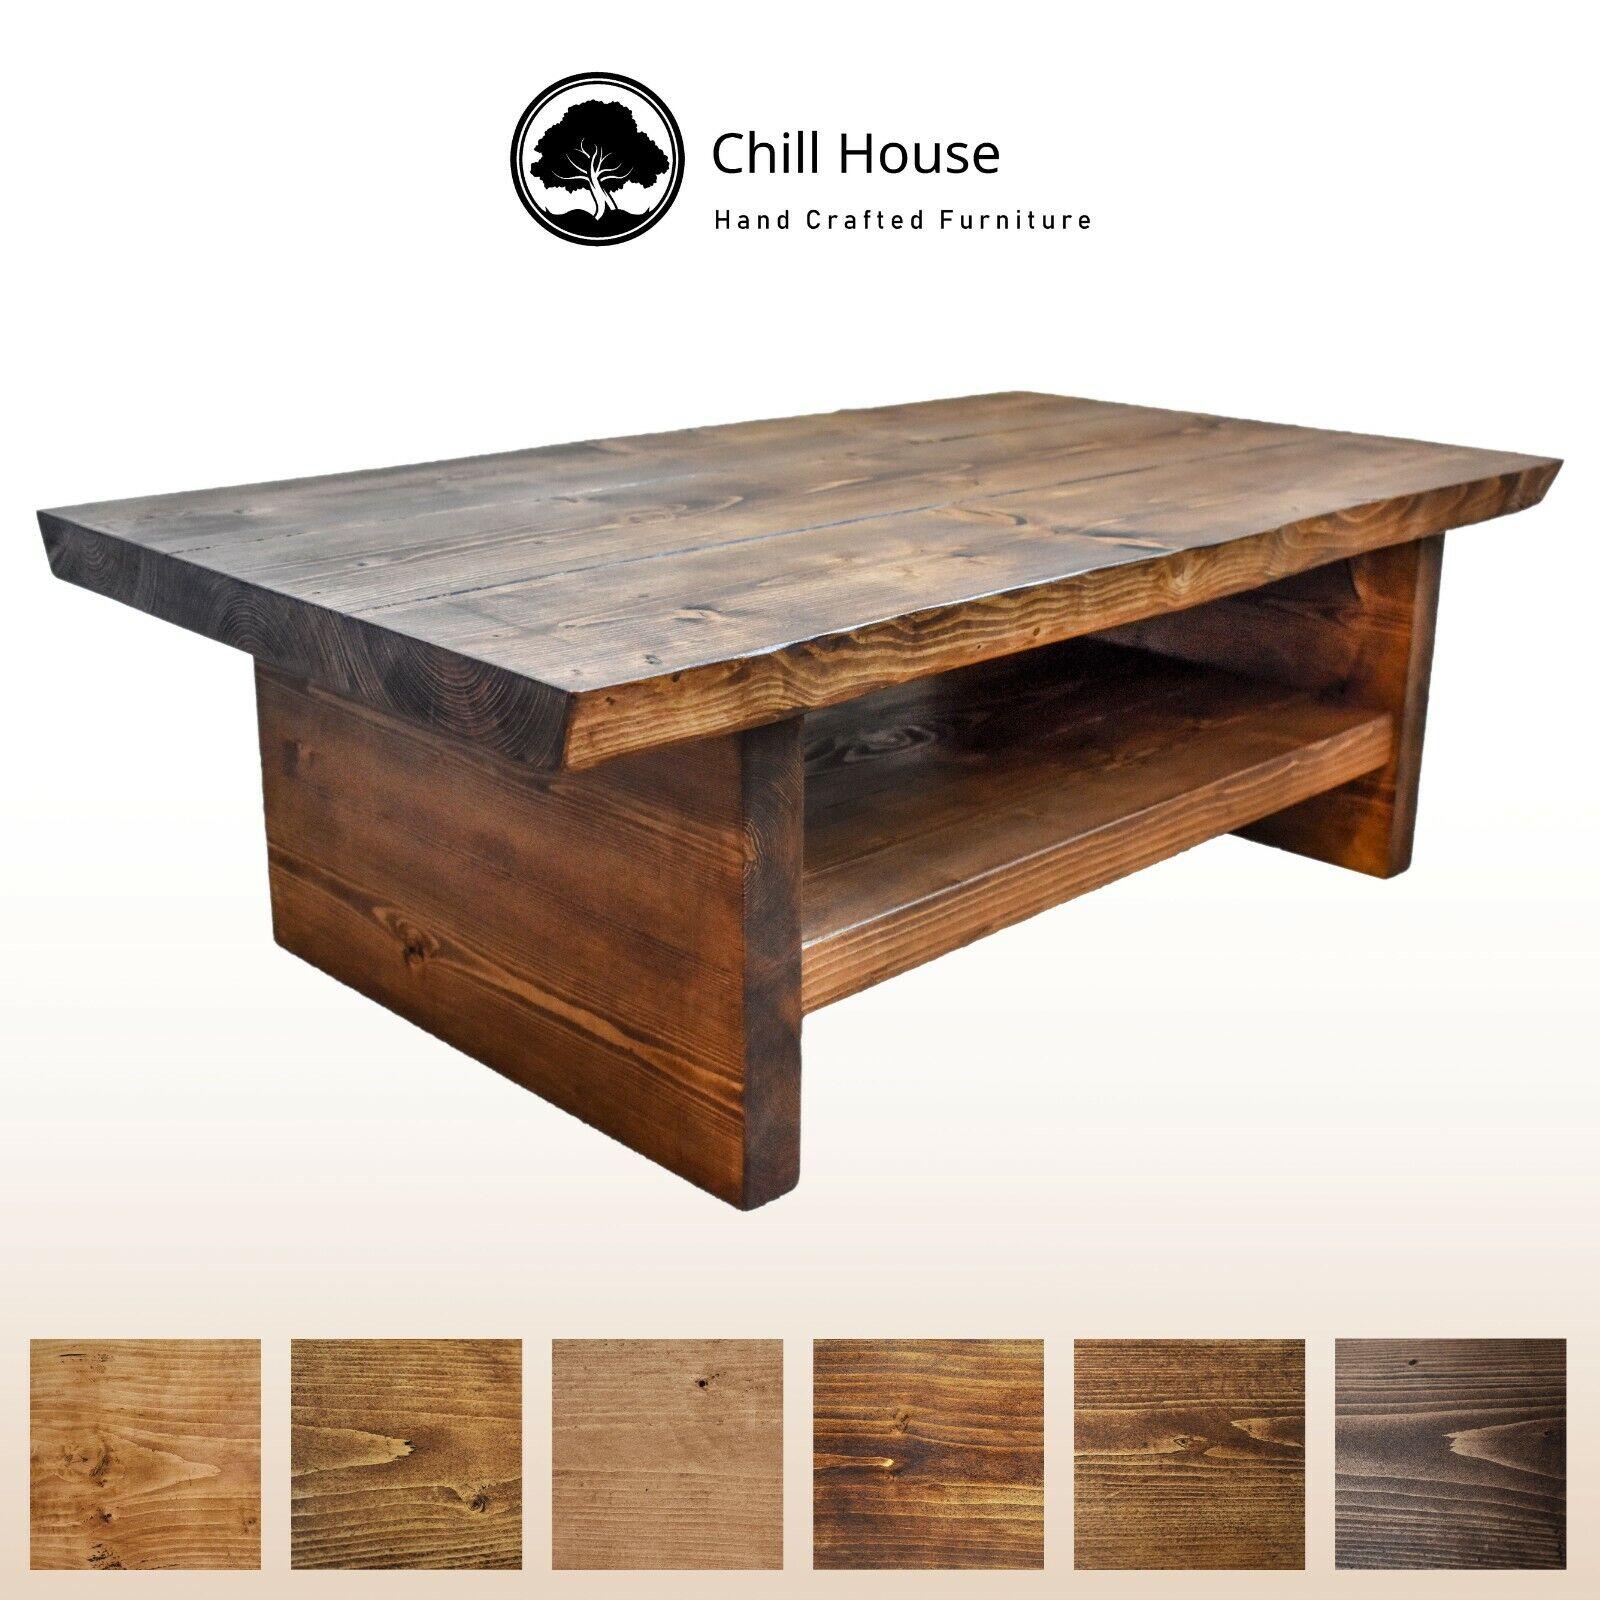 120cm Wood Solid Oak Coffee Table Desk Big Size With Shelf Living Room Furniture For Sale Ebay